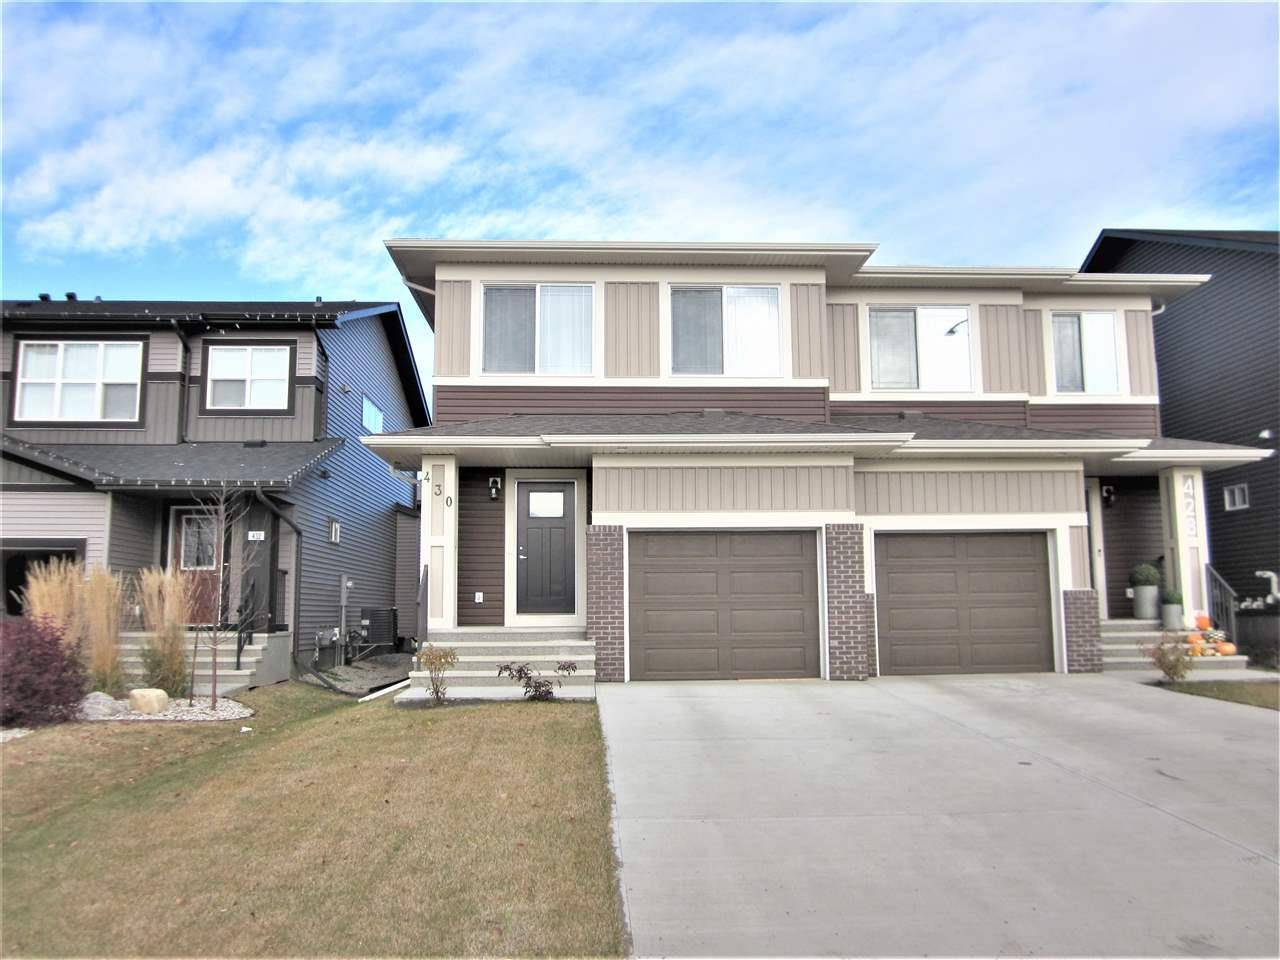 Townhouse for sale at 430 Crystallina Nera Dr Nw Edmonton Alberta - MLS: E4178165